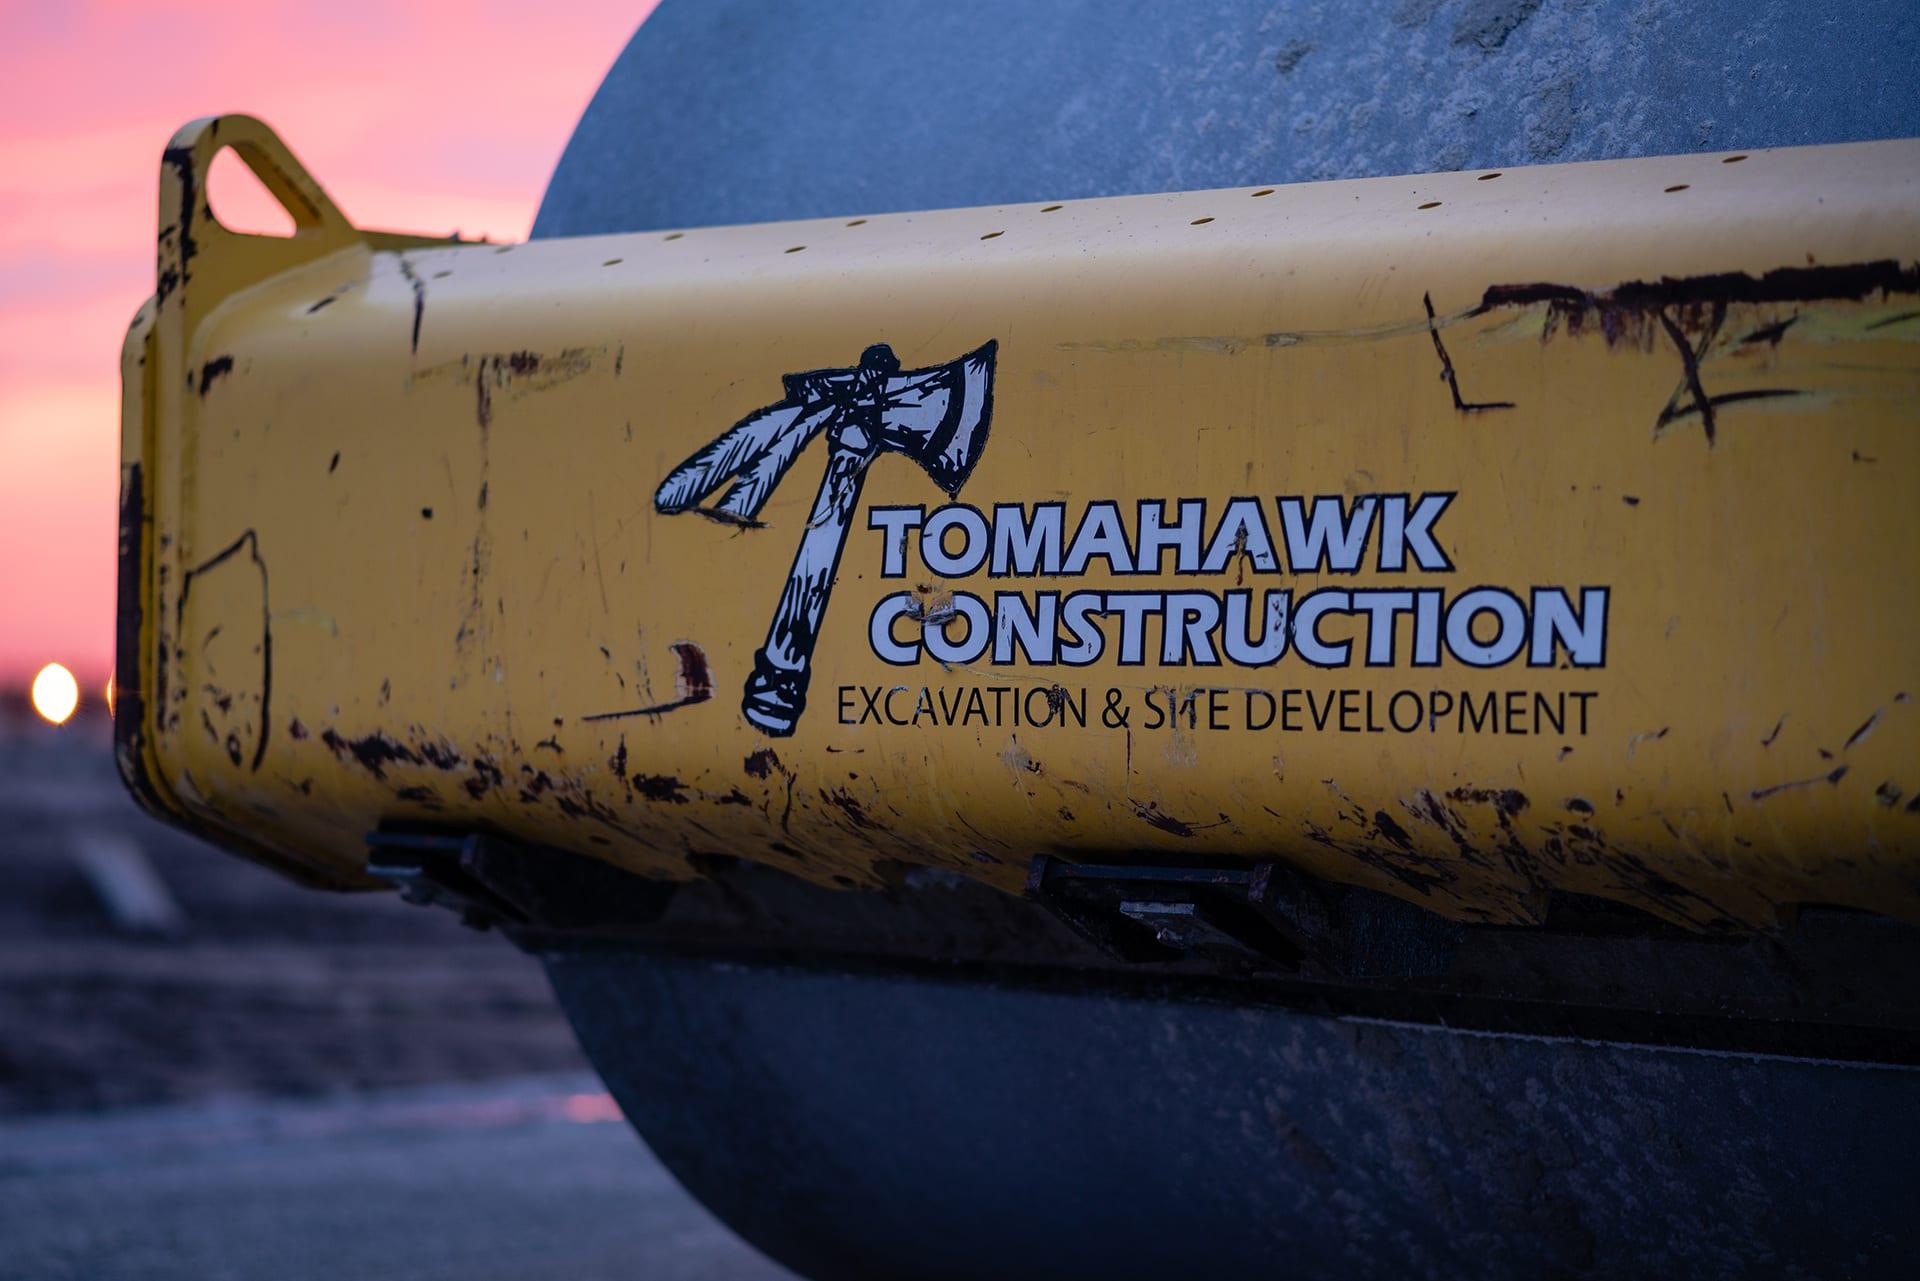 Tomahawk Background